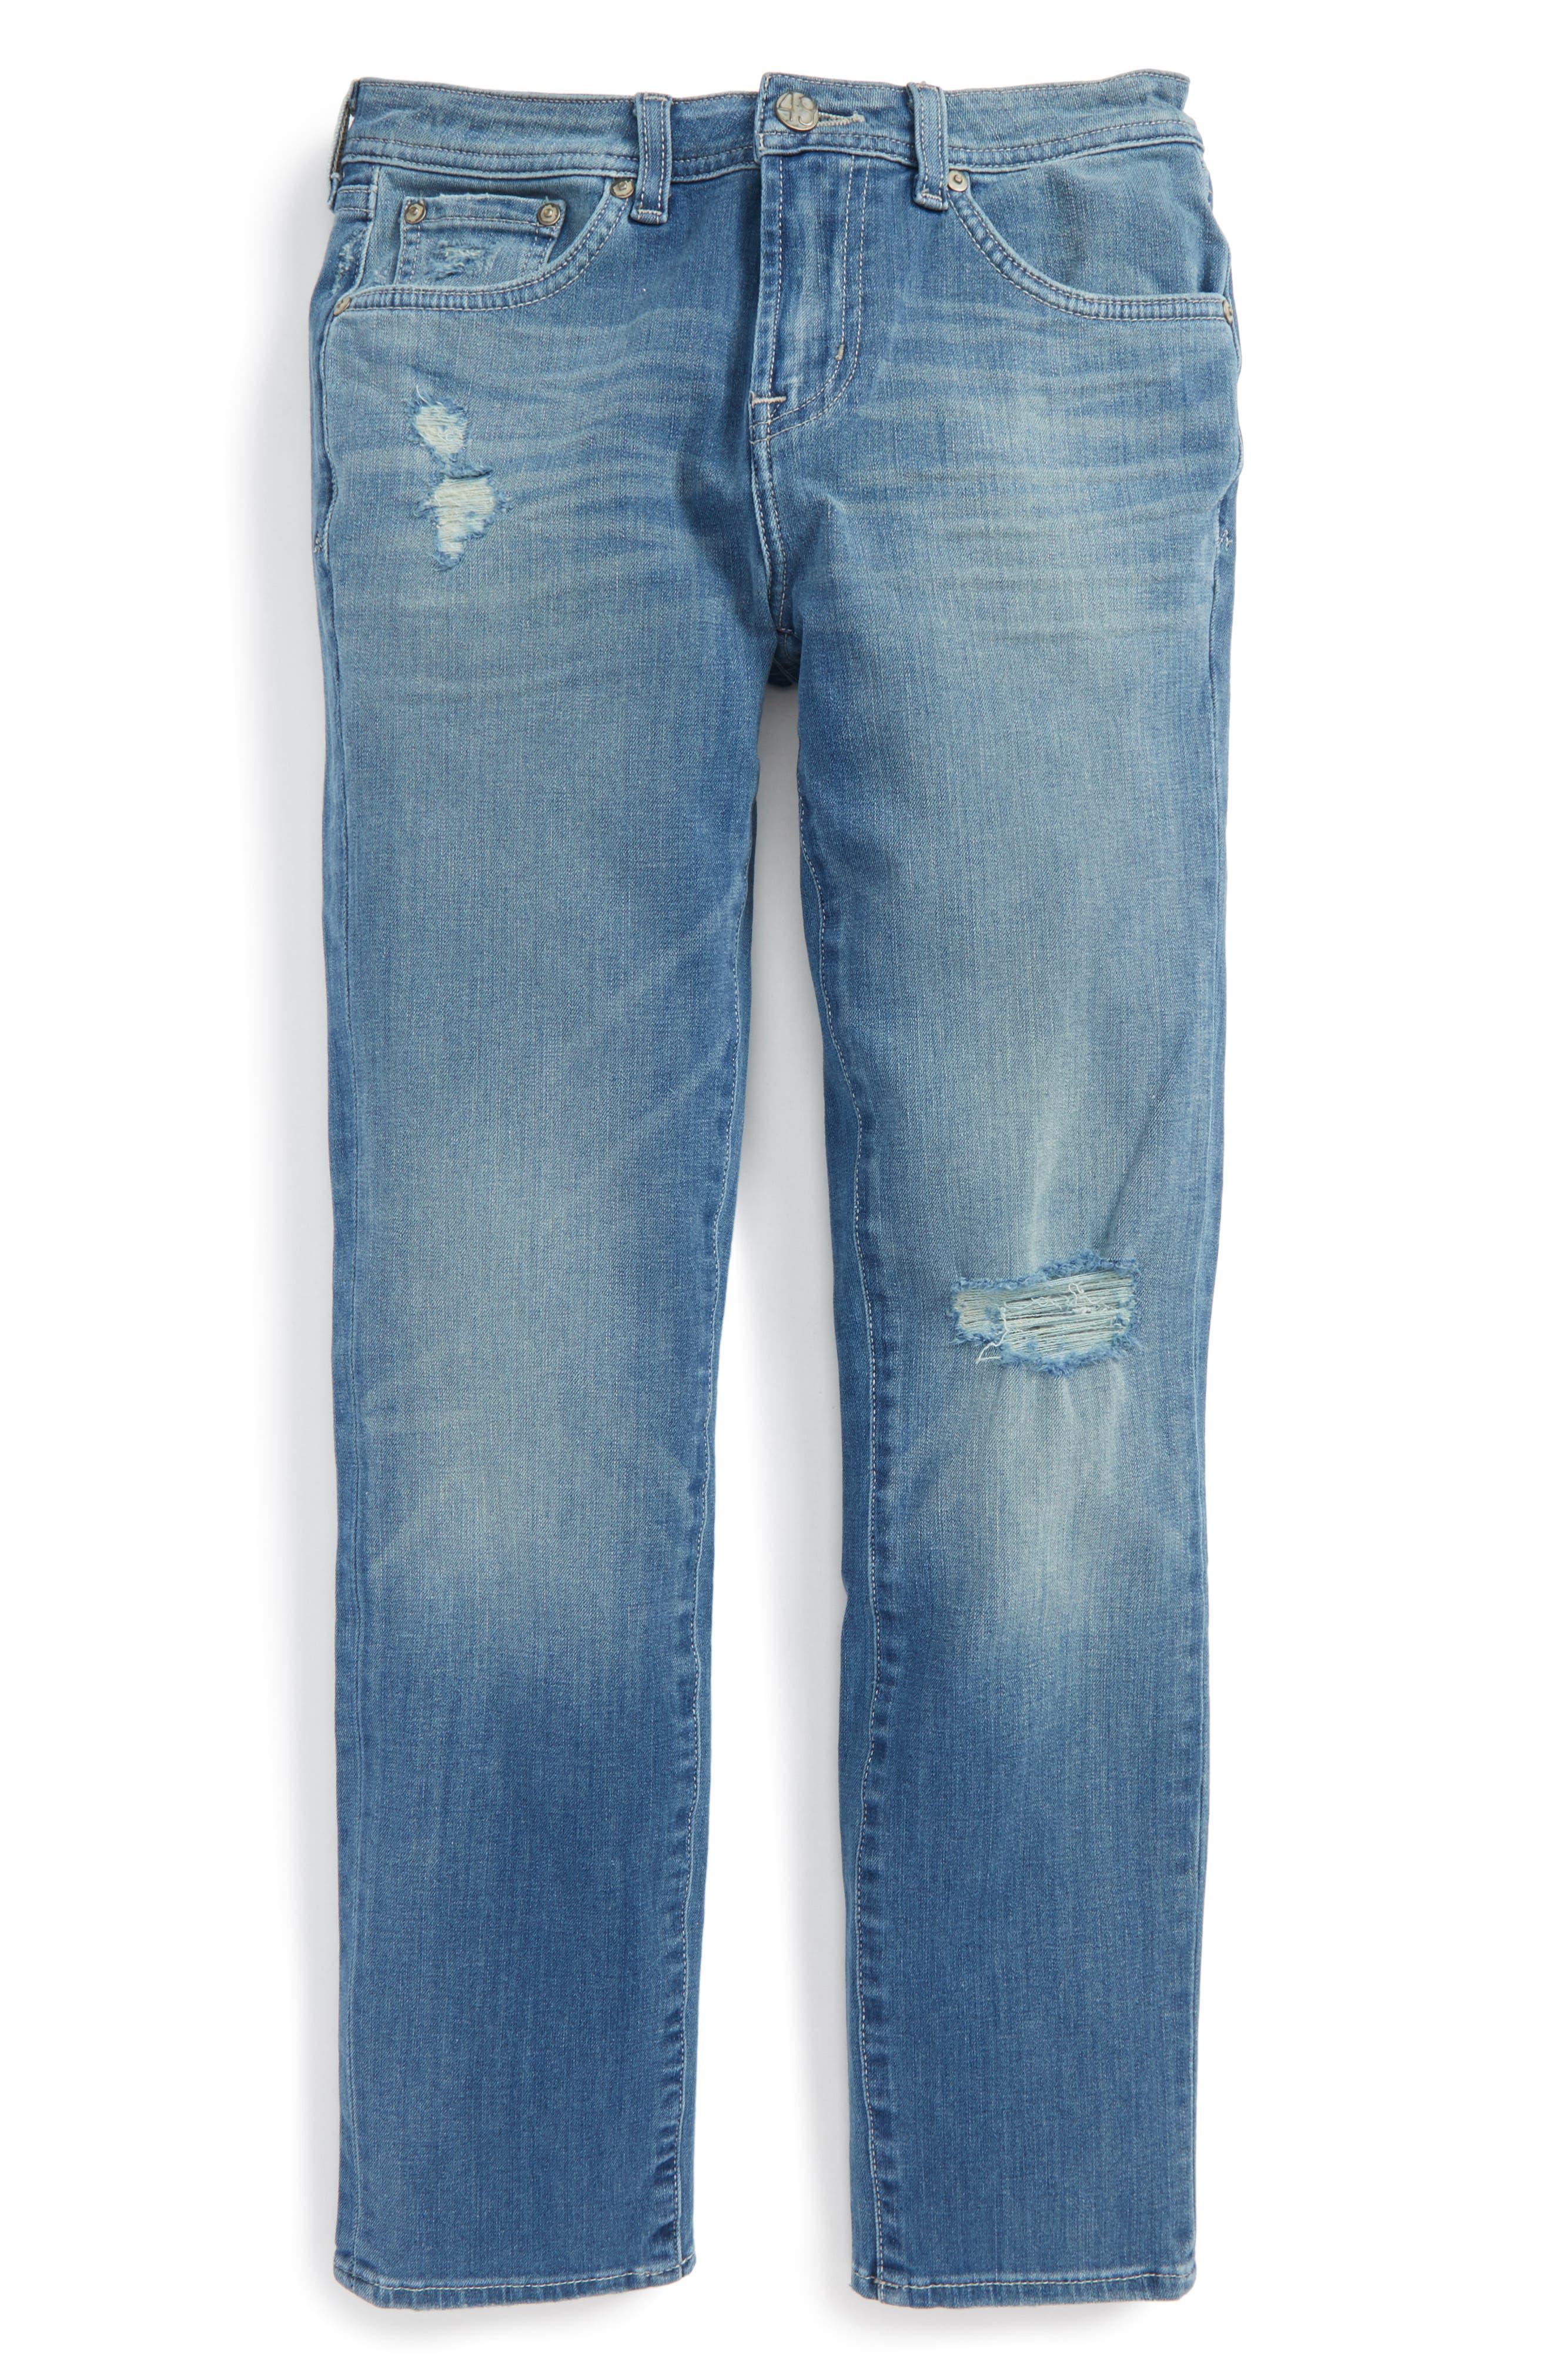 Alternate Image 1 Selected - ag adriano goldschmied kids The Noah Slim Straight Leg Jeans (Big Boys)